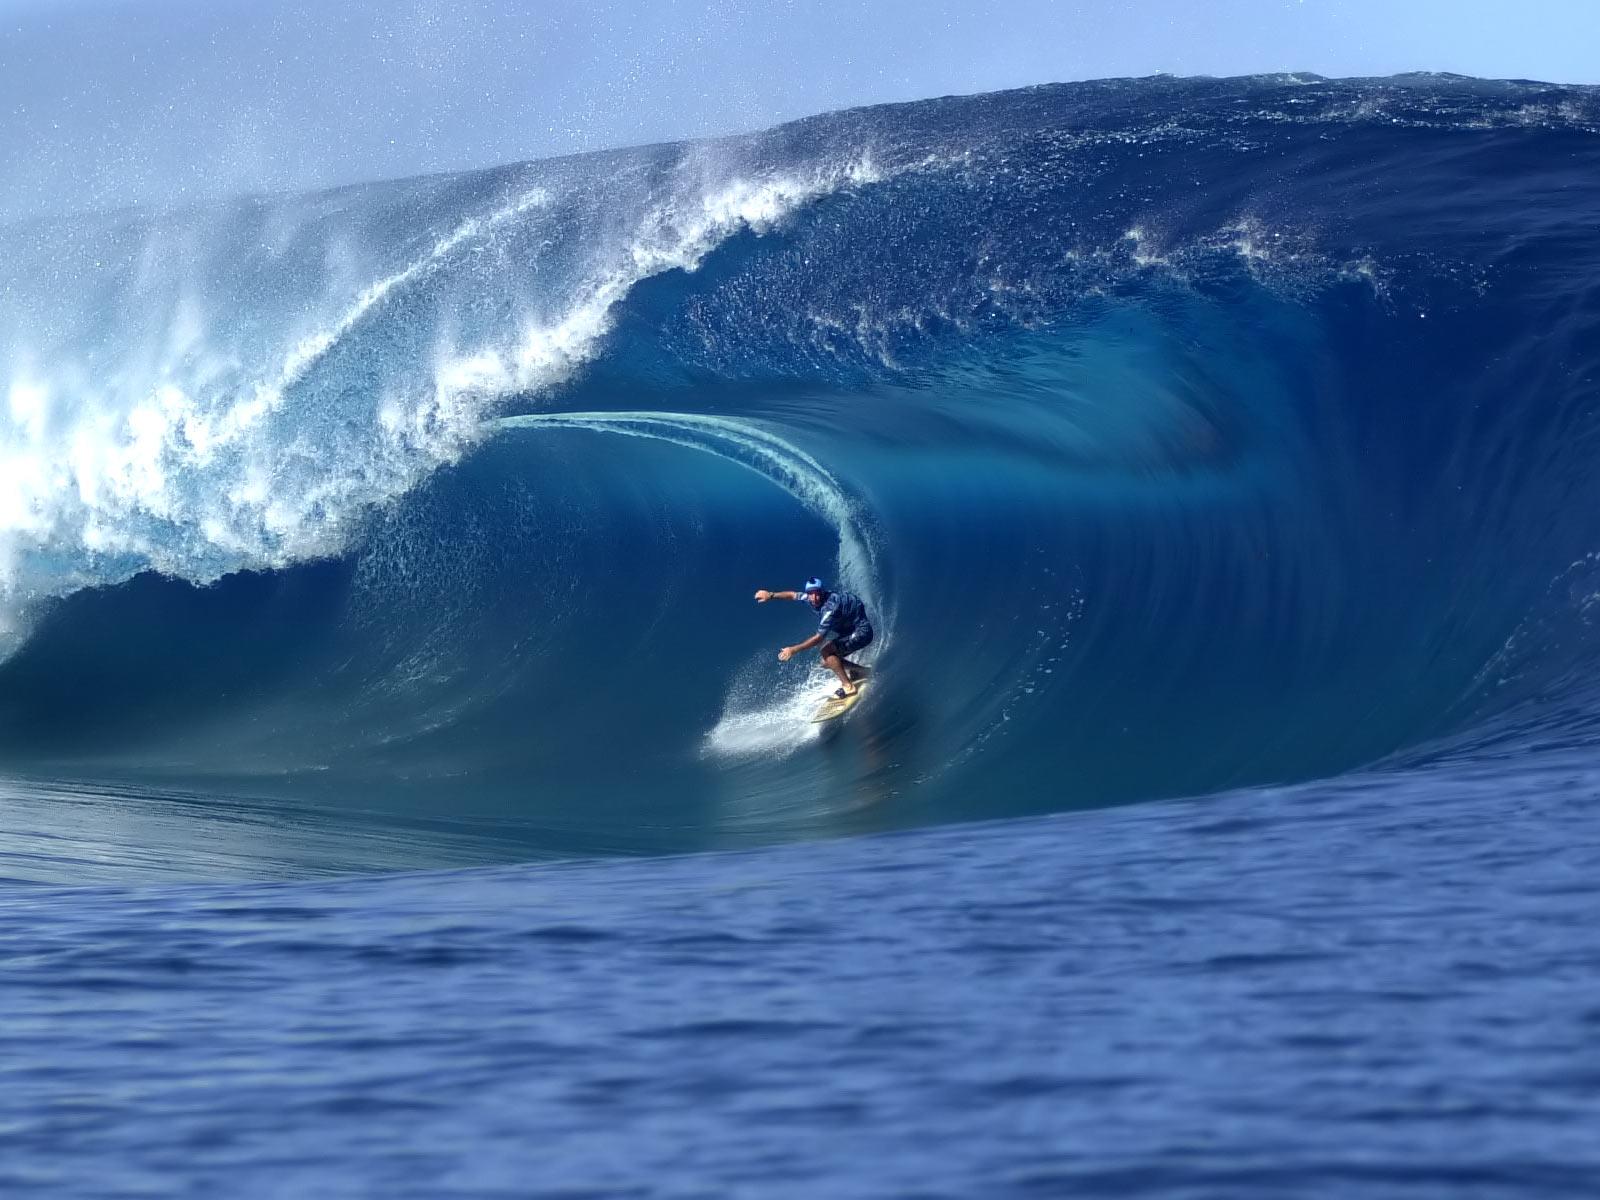 http://2.bp.blogspot.com/_WriF8m2mVt0/THVWKpvkOkI/AAAAAAAAFuY/dvZOE9tt6gk/s1600/Surfing_Hawaii.jpg